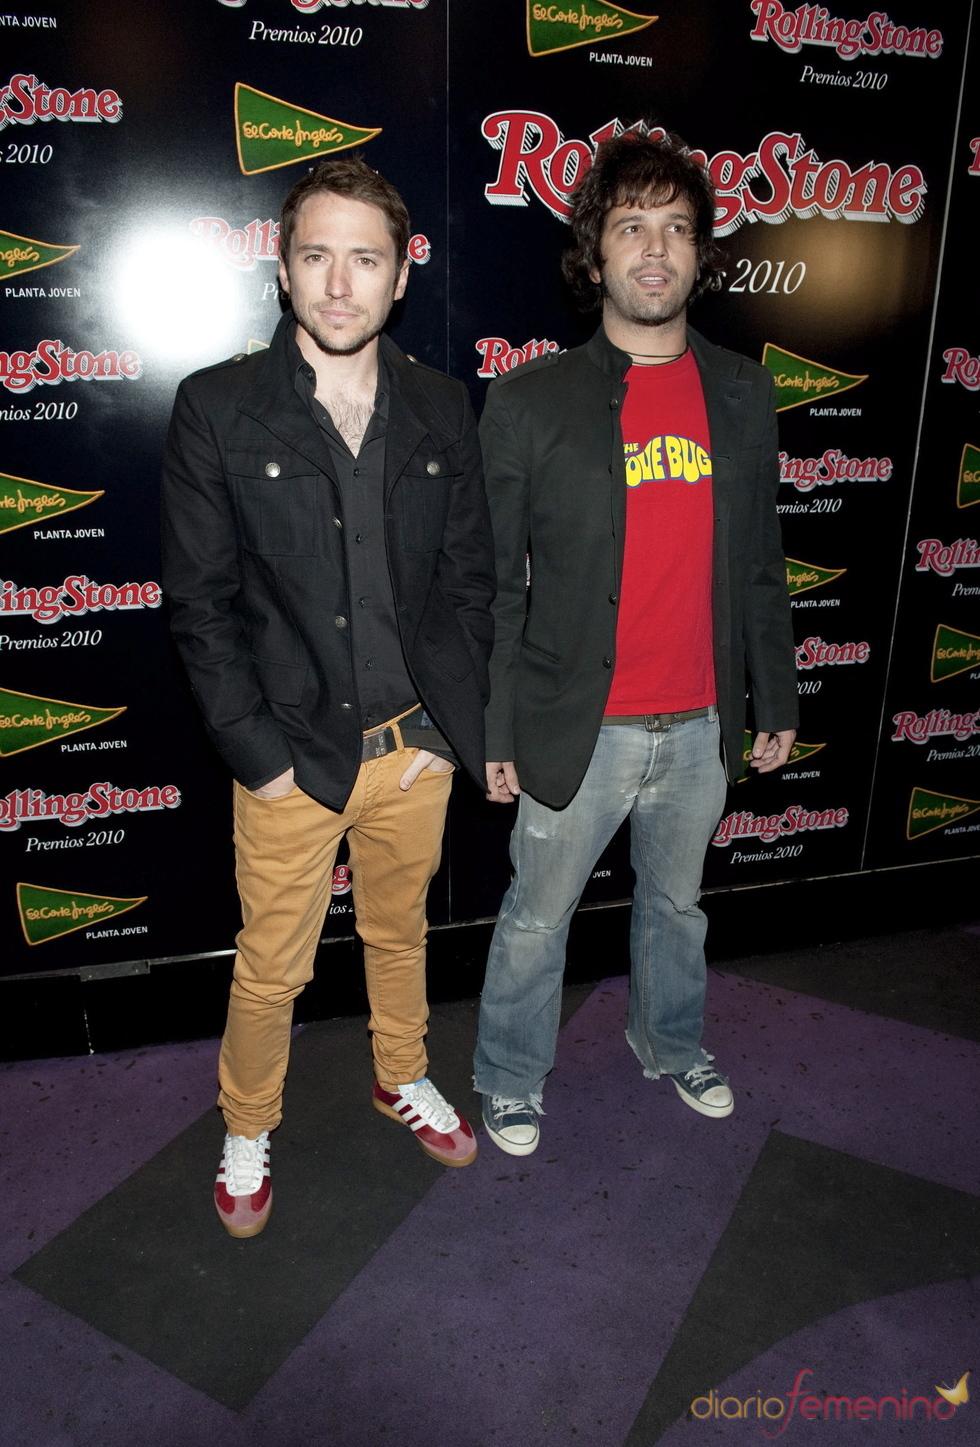 Premios Rolling Stone 2010 con Mota